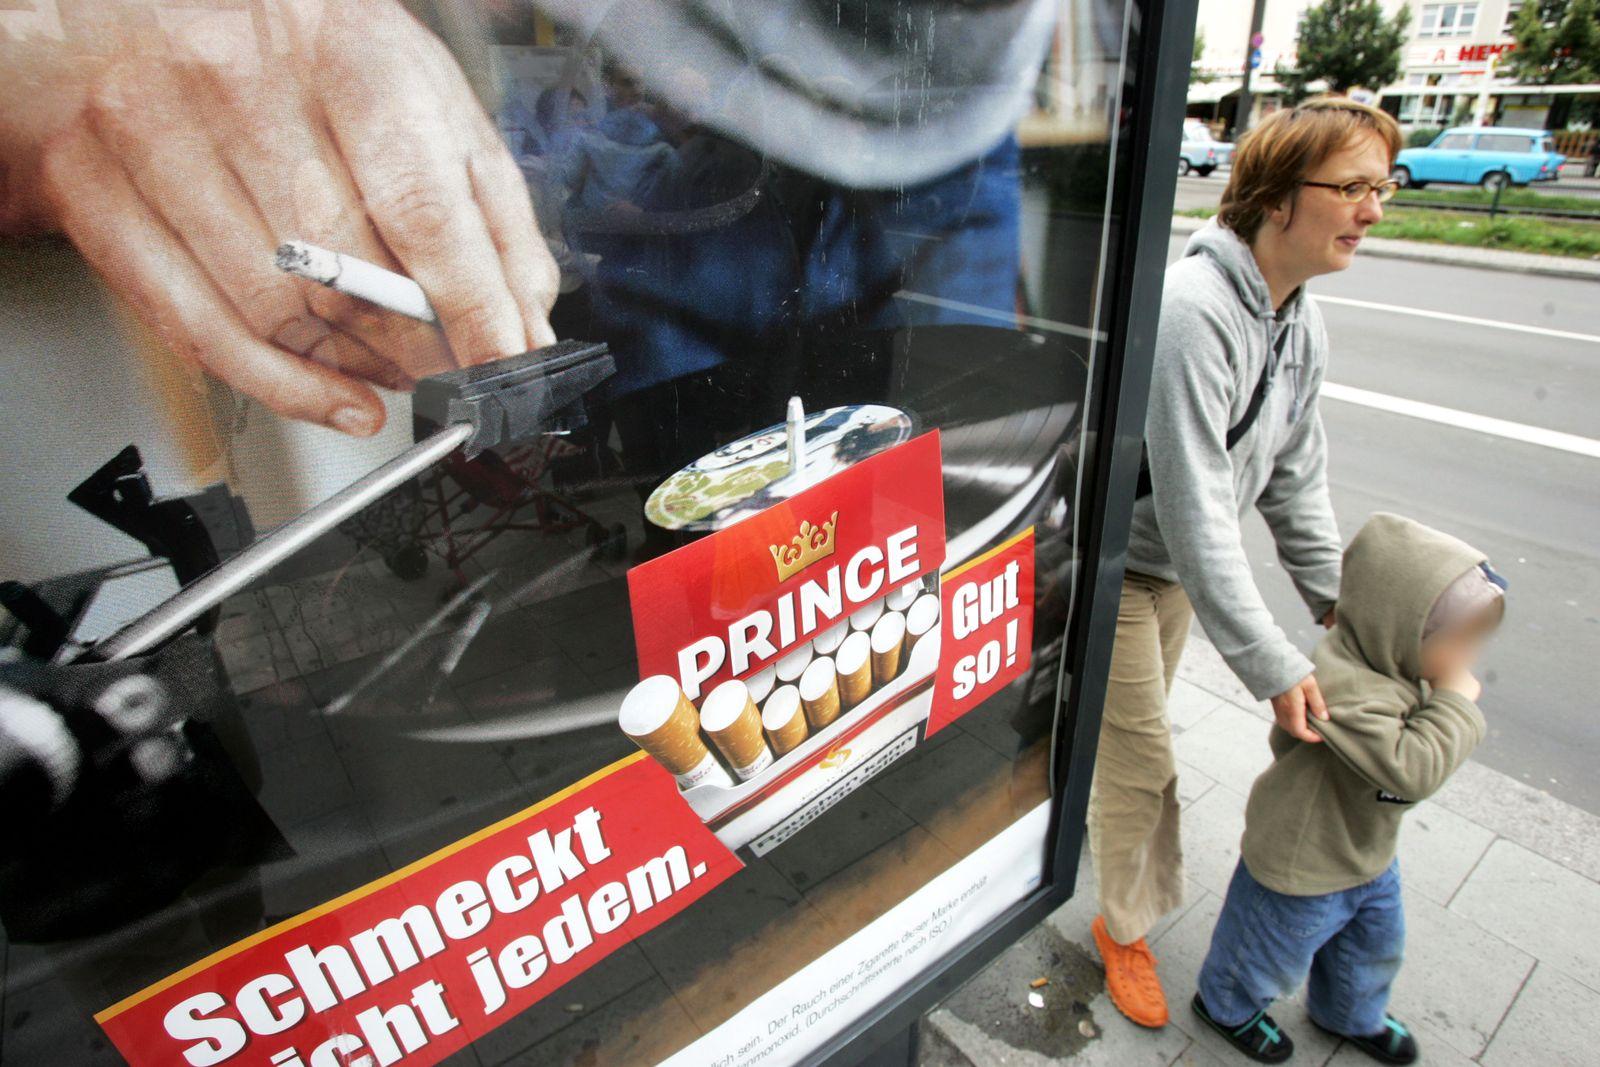 Tabak-Werbung / Zigaretten-Werbung